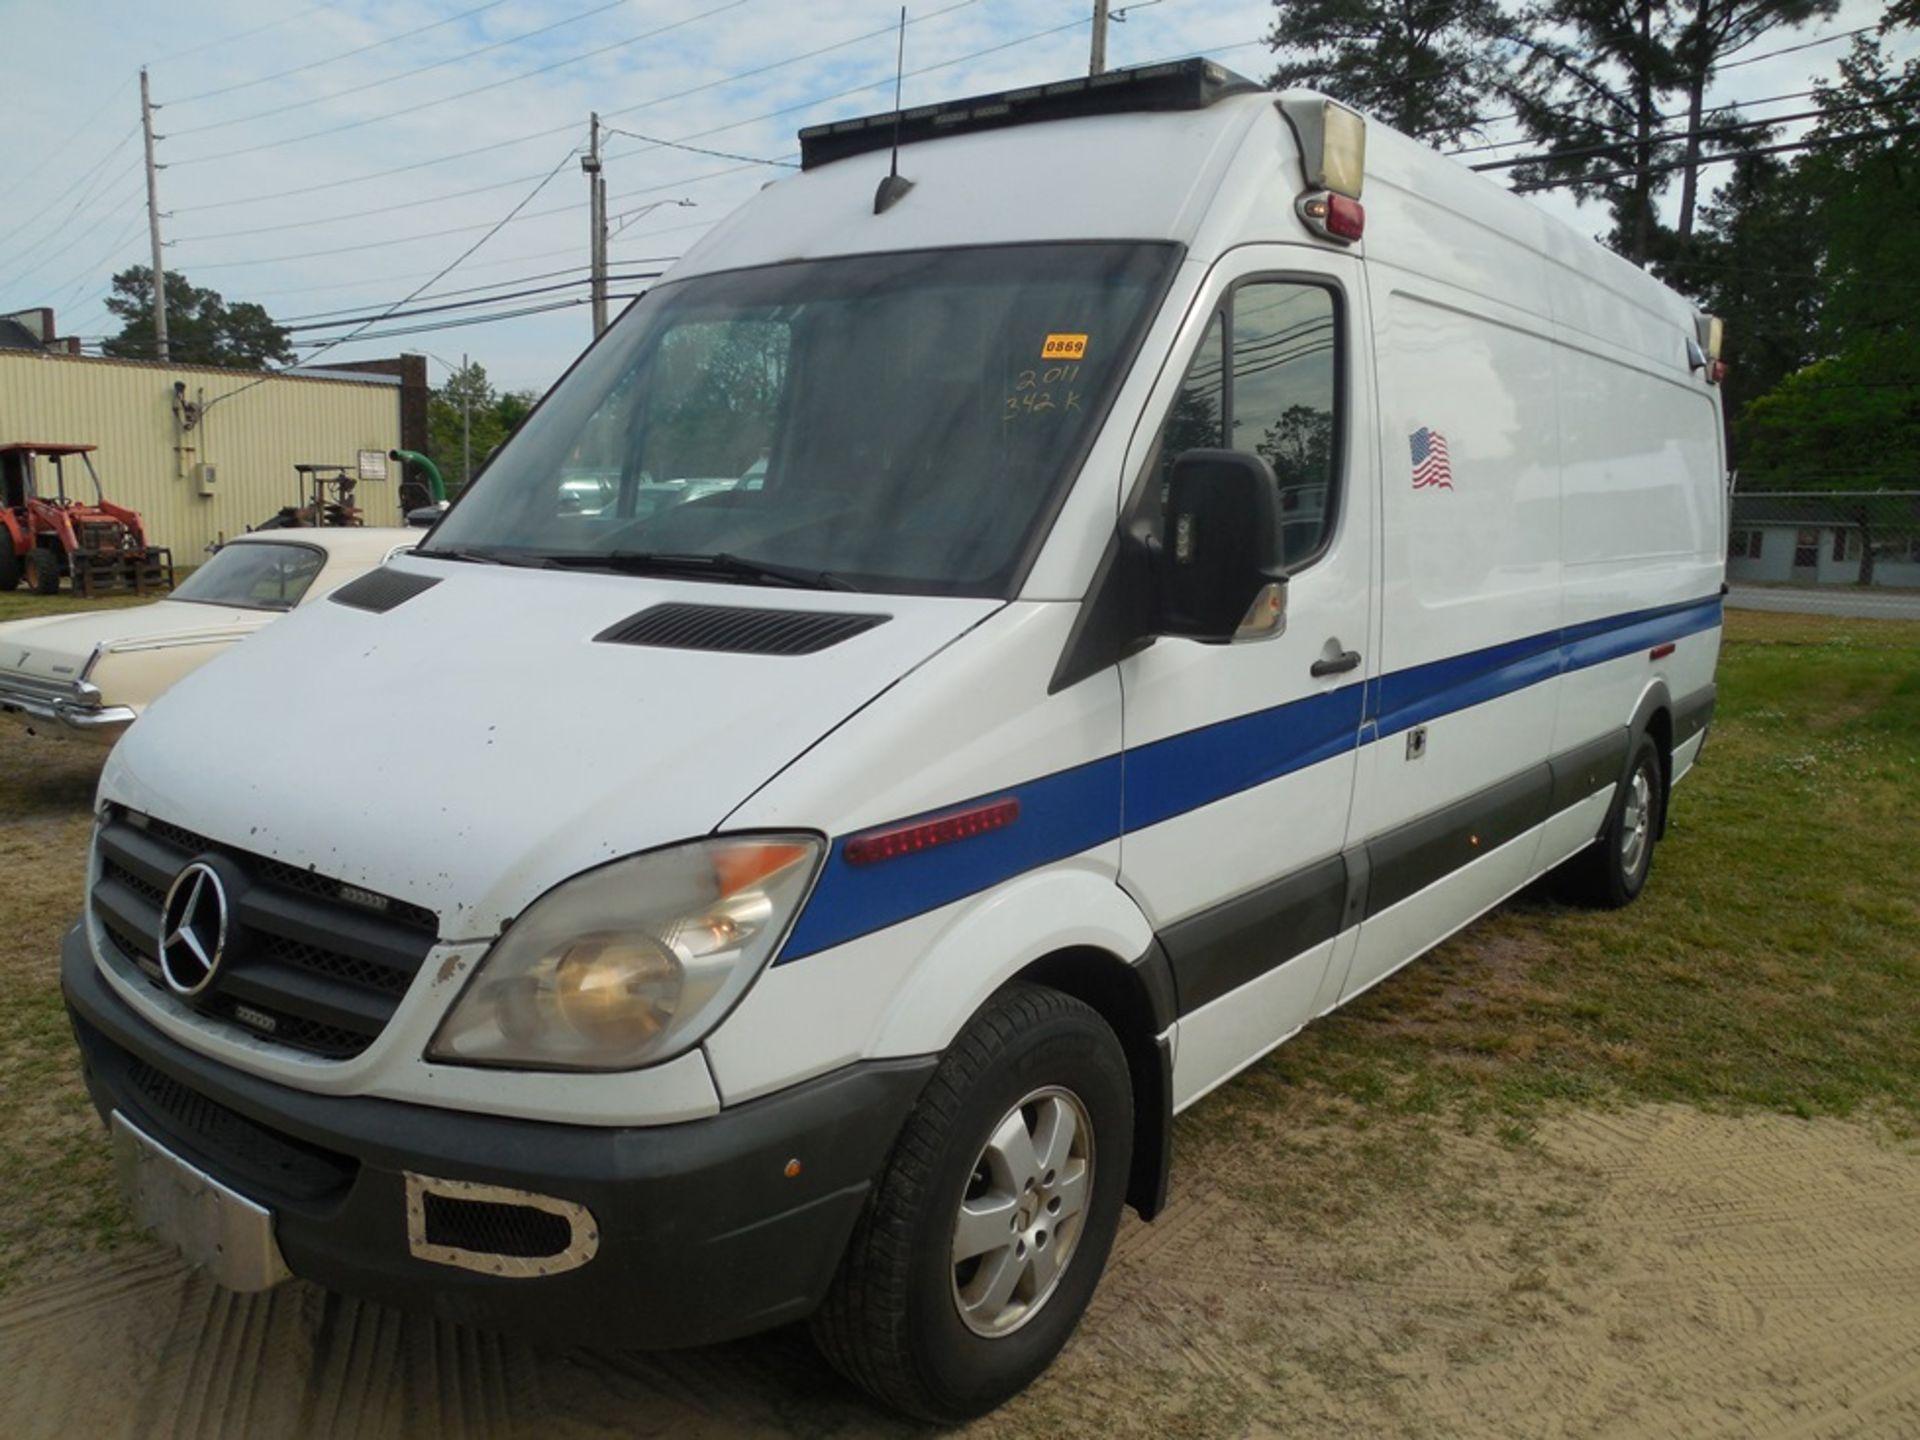 2011 Mercedes Sprinter dsl, ambulance 324,914 miles vin# WD3PE8CC6B5504105 - Image 2 of 6